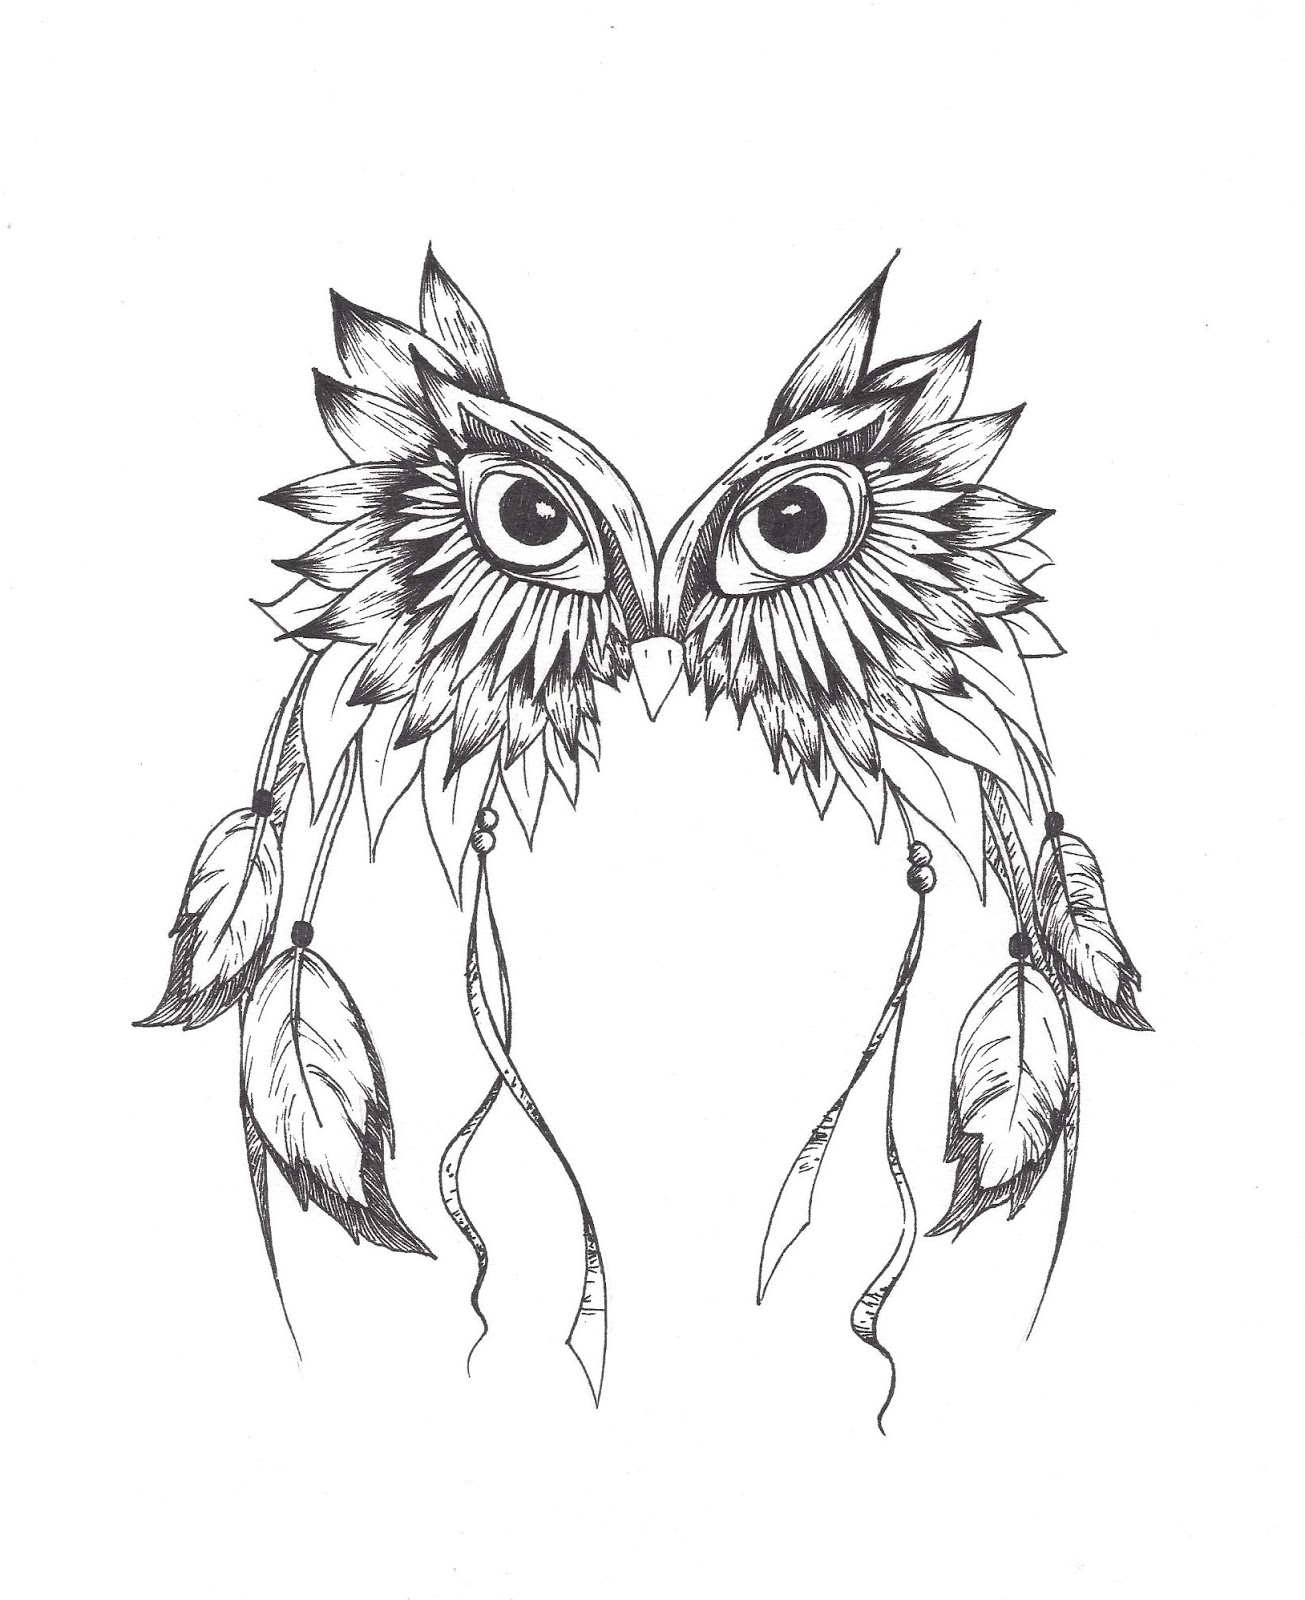 Owl dreamcatcher drawing - photo#31